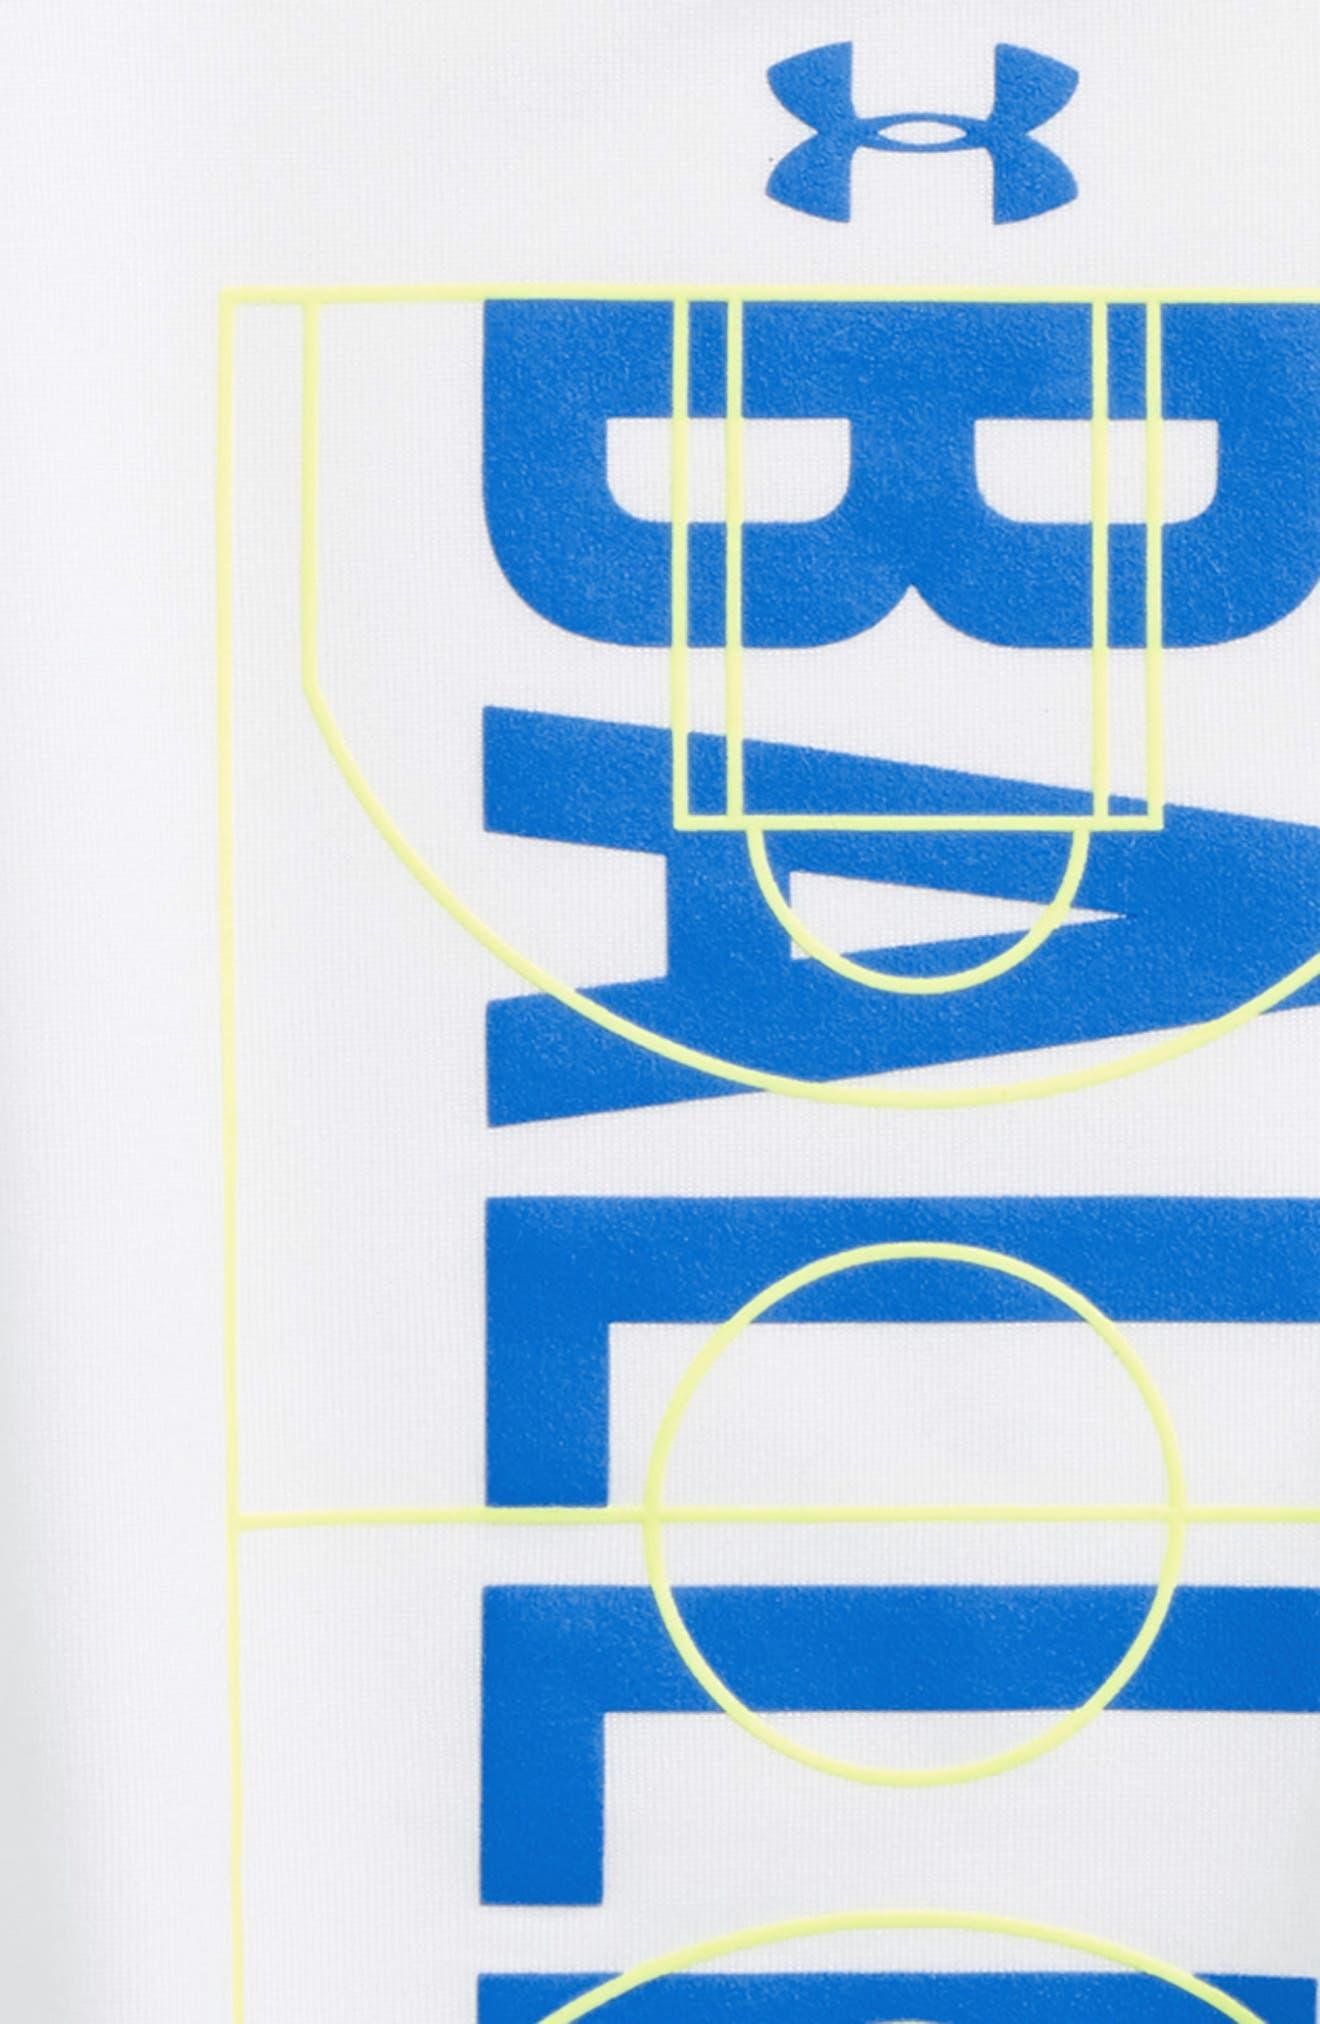 Baller HeatGear<sup>®</sup> Glow-in-the-Dark T-Shirt,                             Alternate thumbnail 2, color,                             White